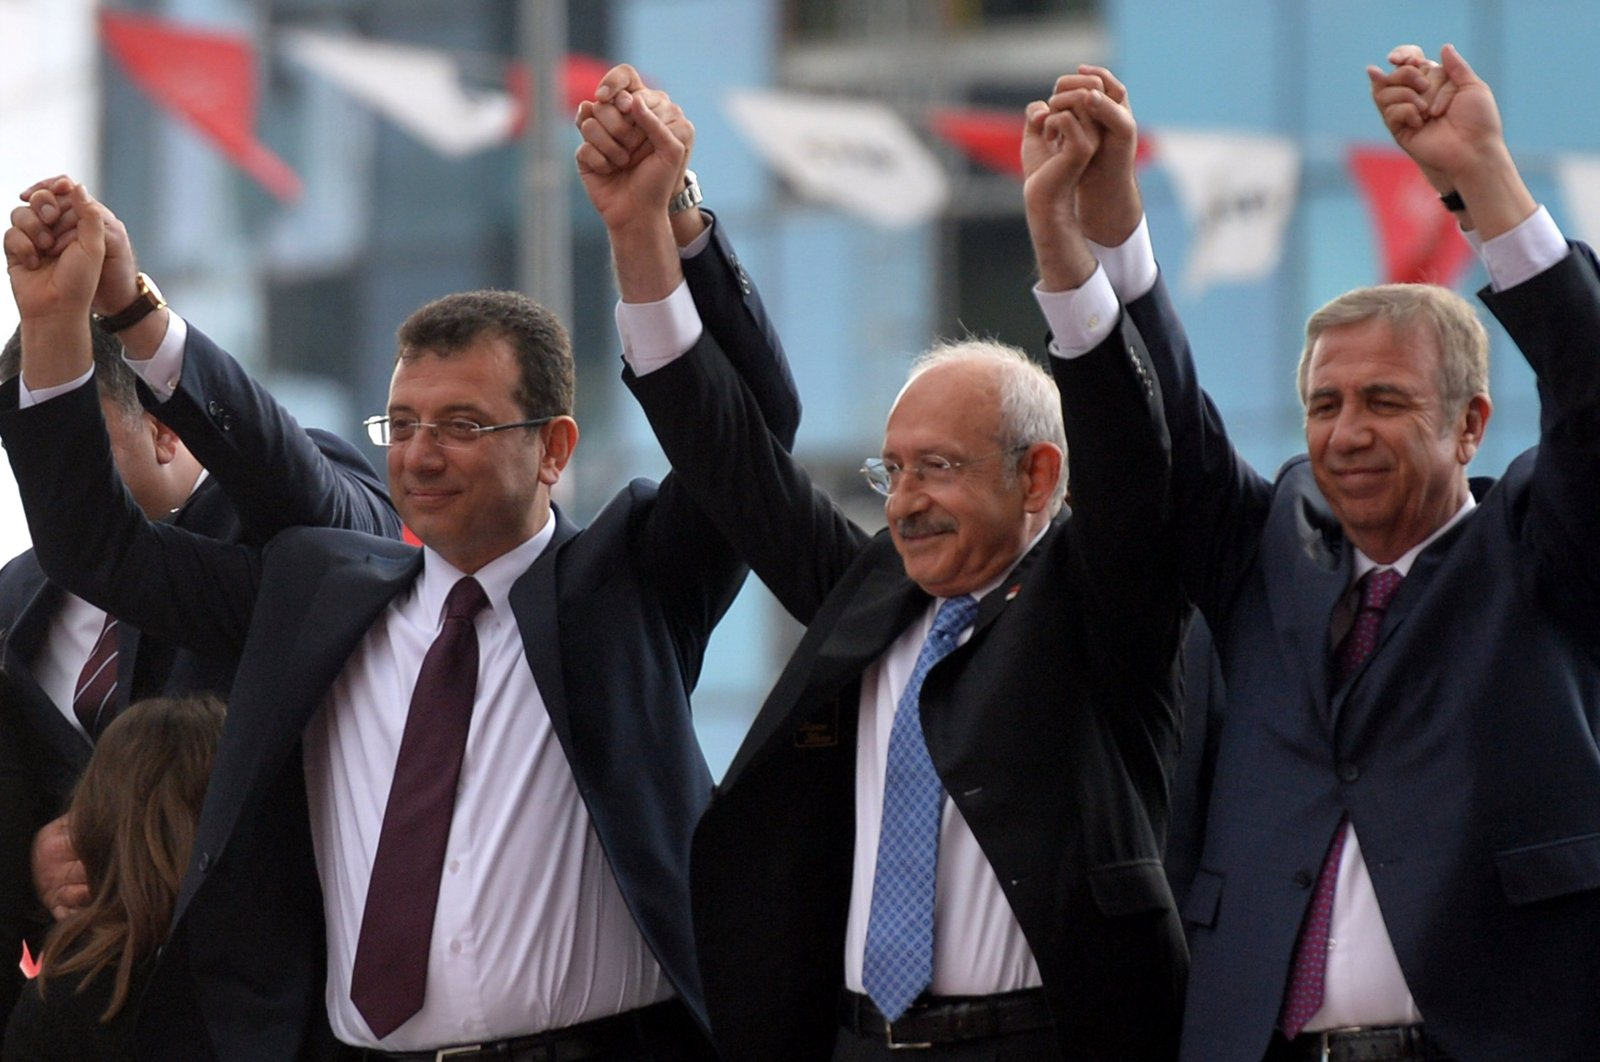 CHP Chairman Kemal Kılıçdaroğlu (C) with Istanbul Metropolitan Mayor Ekrem Imamoğlu (L) and Ankara Metropolitan Mayor Mansur Yavaş (R) in front of the CHP Headquarters in Ankara on April 2, 2019. (Sabah File Photo)